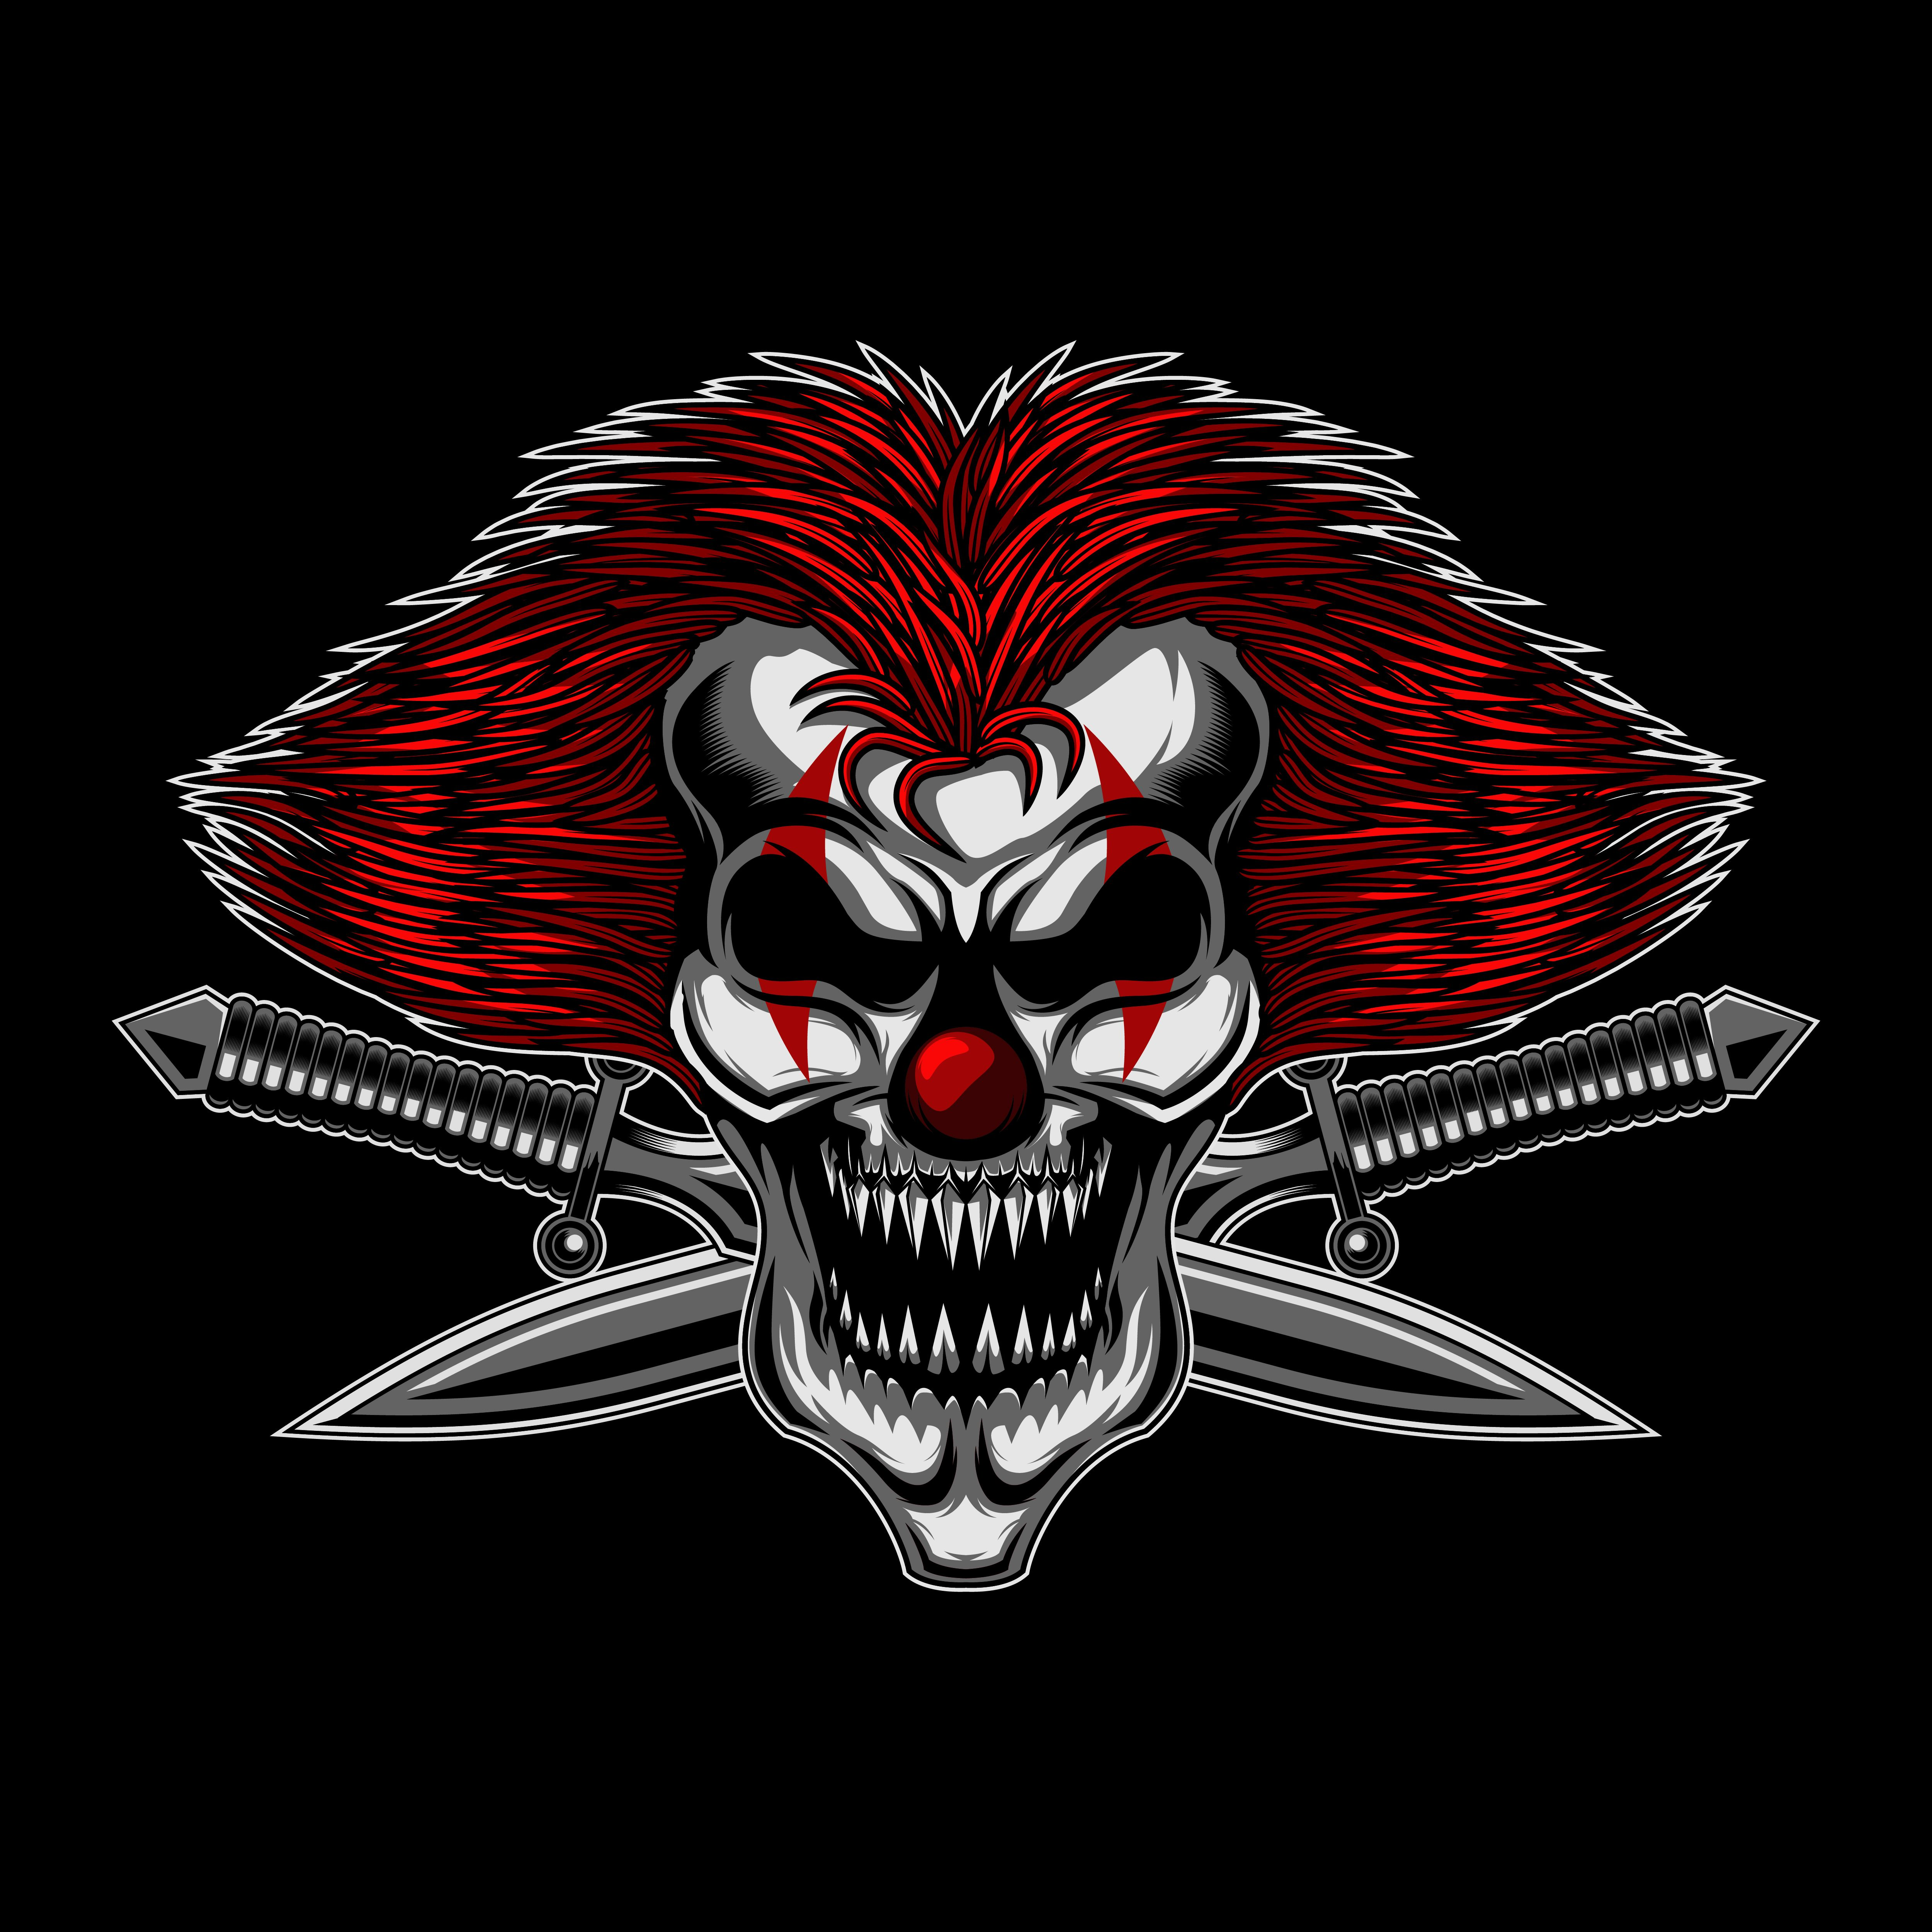 Angry Skull Clown Cross Sword Neon Backgrounds Vector Illustration Photo Logo Design